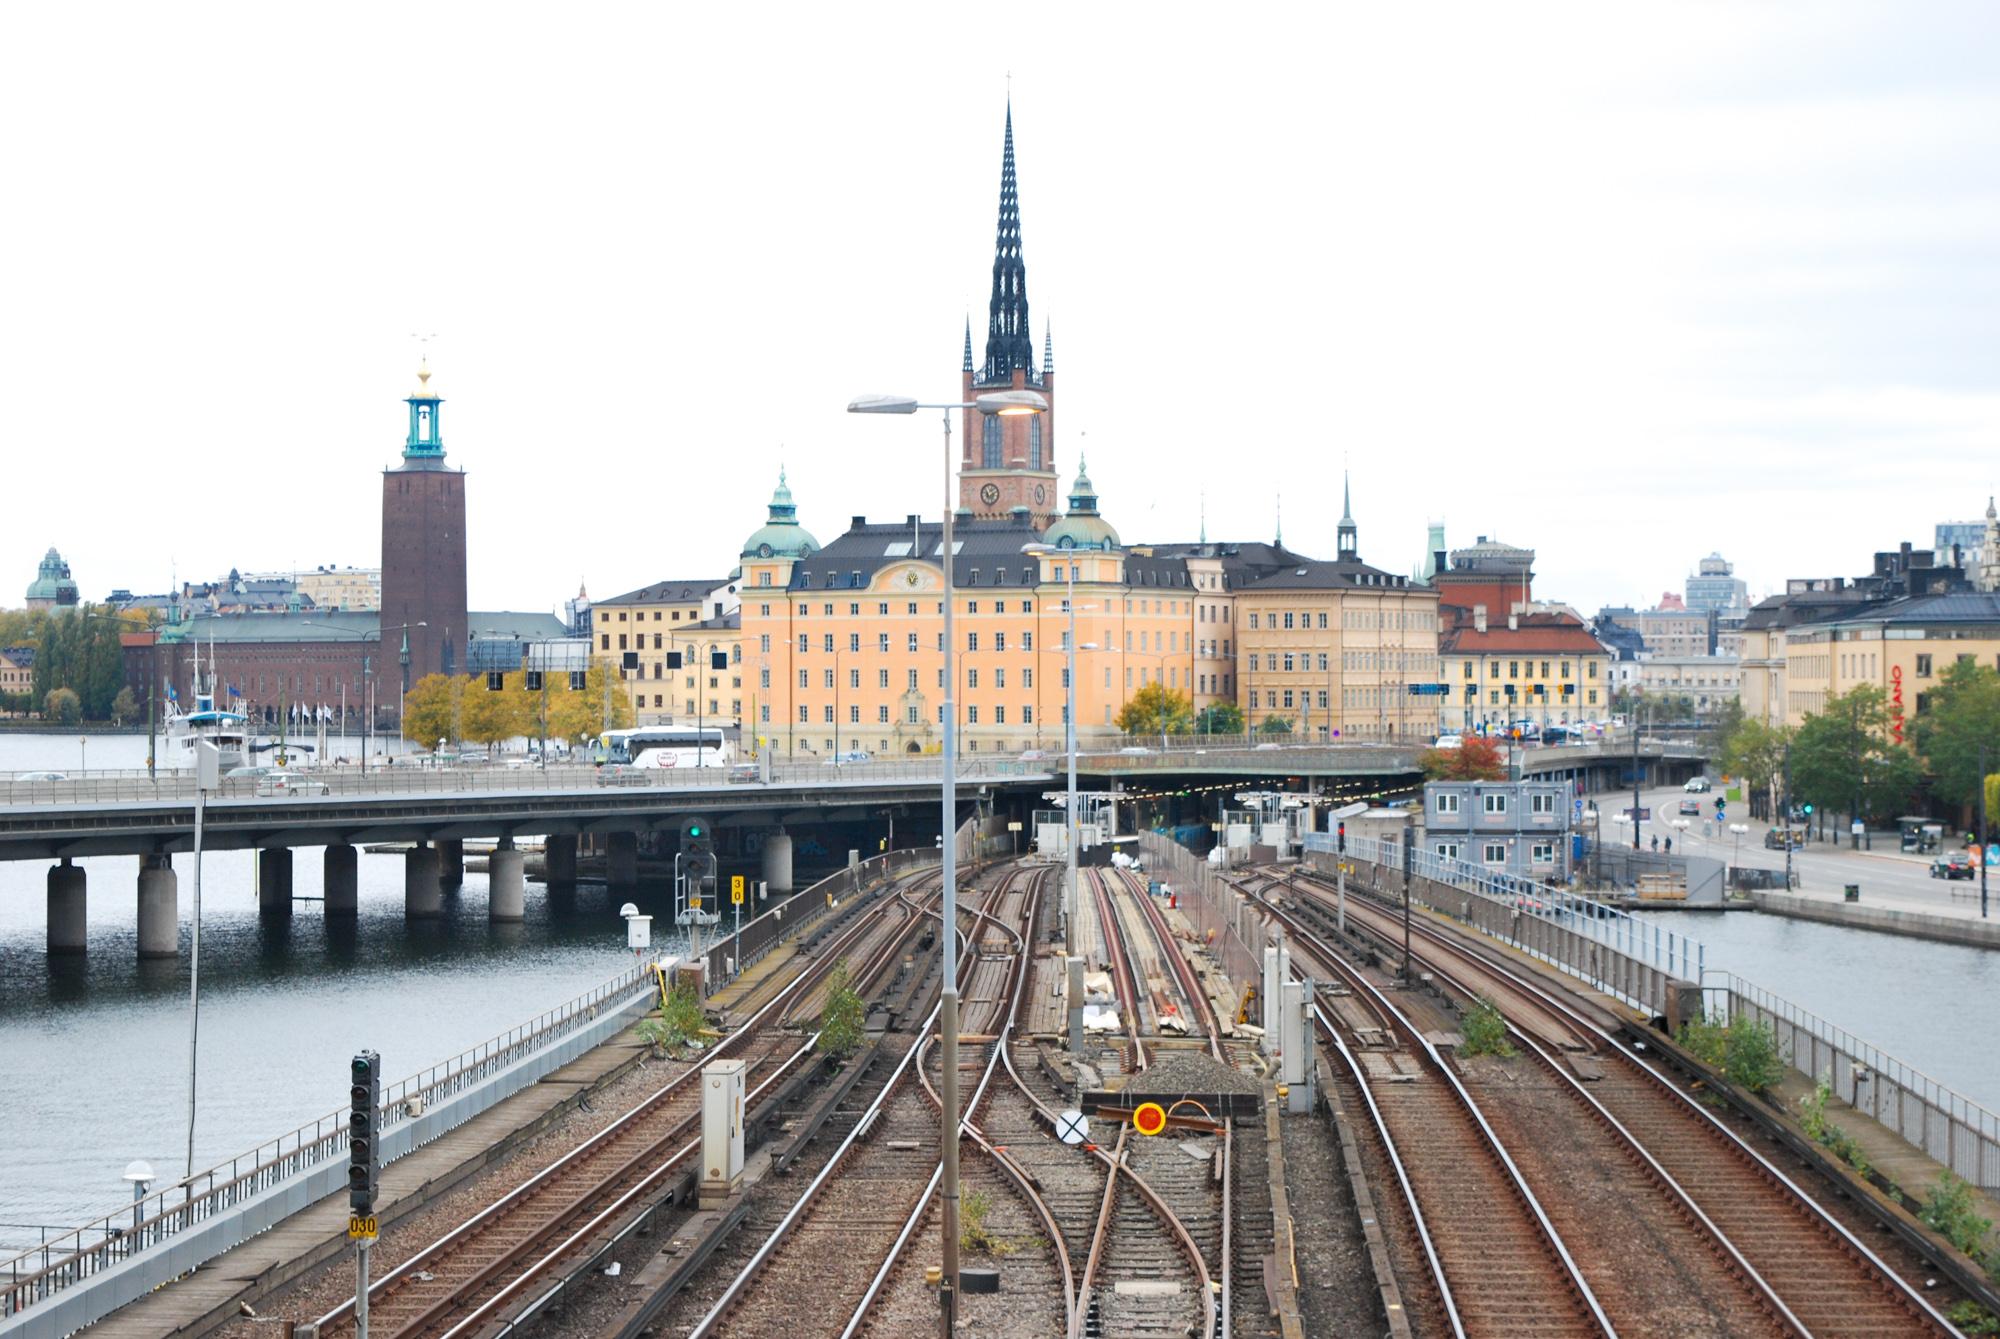 stockholm-train-tracks